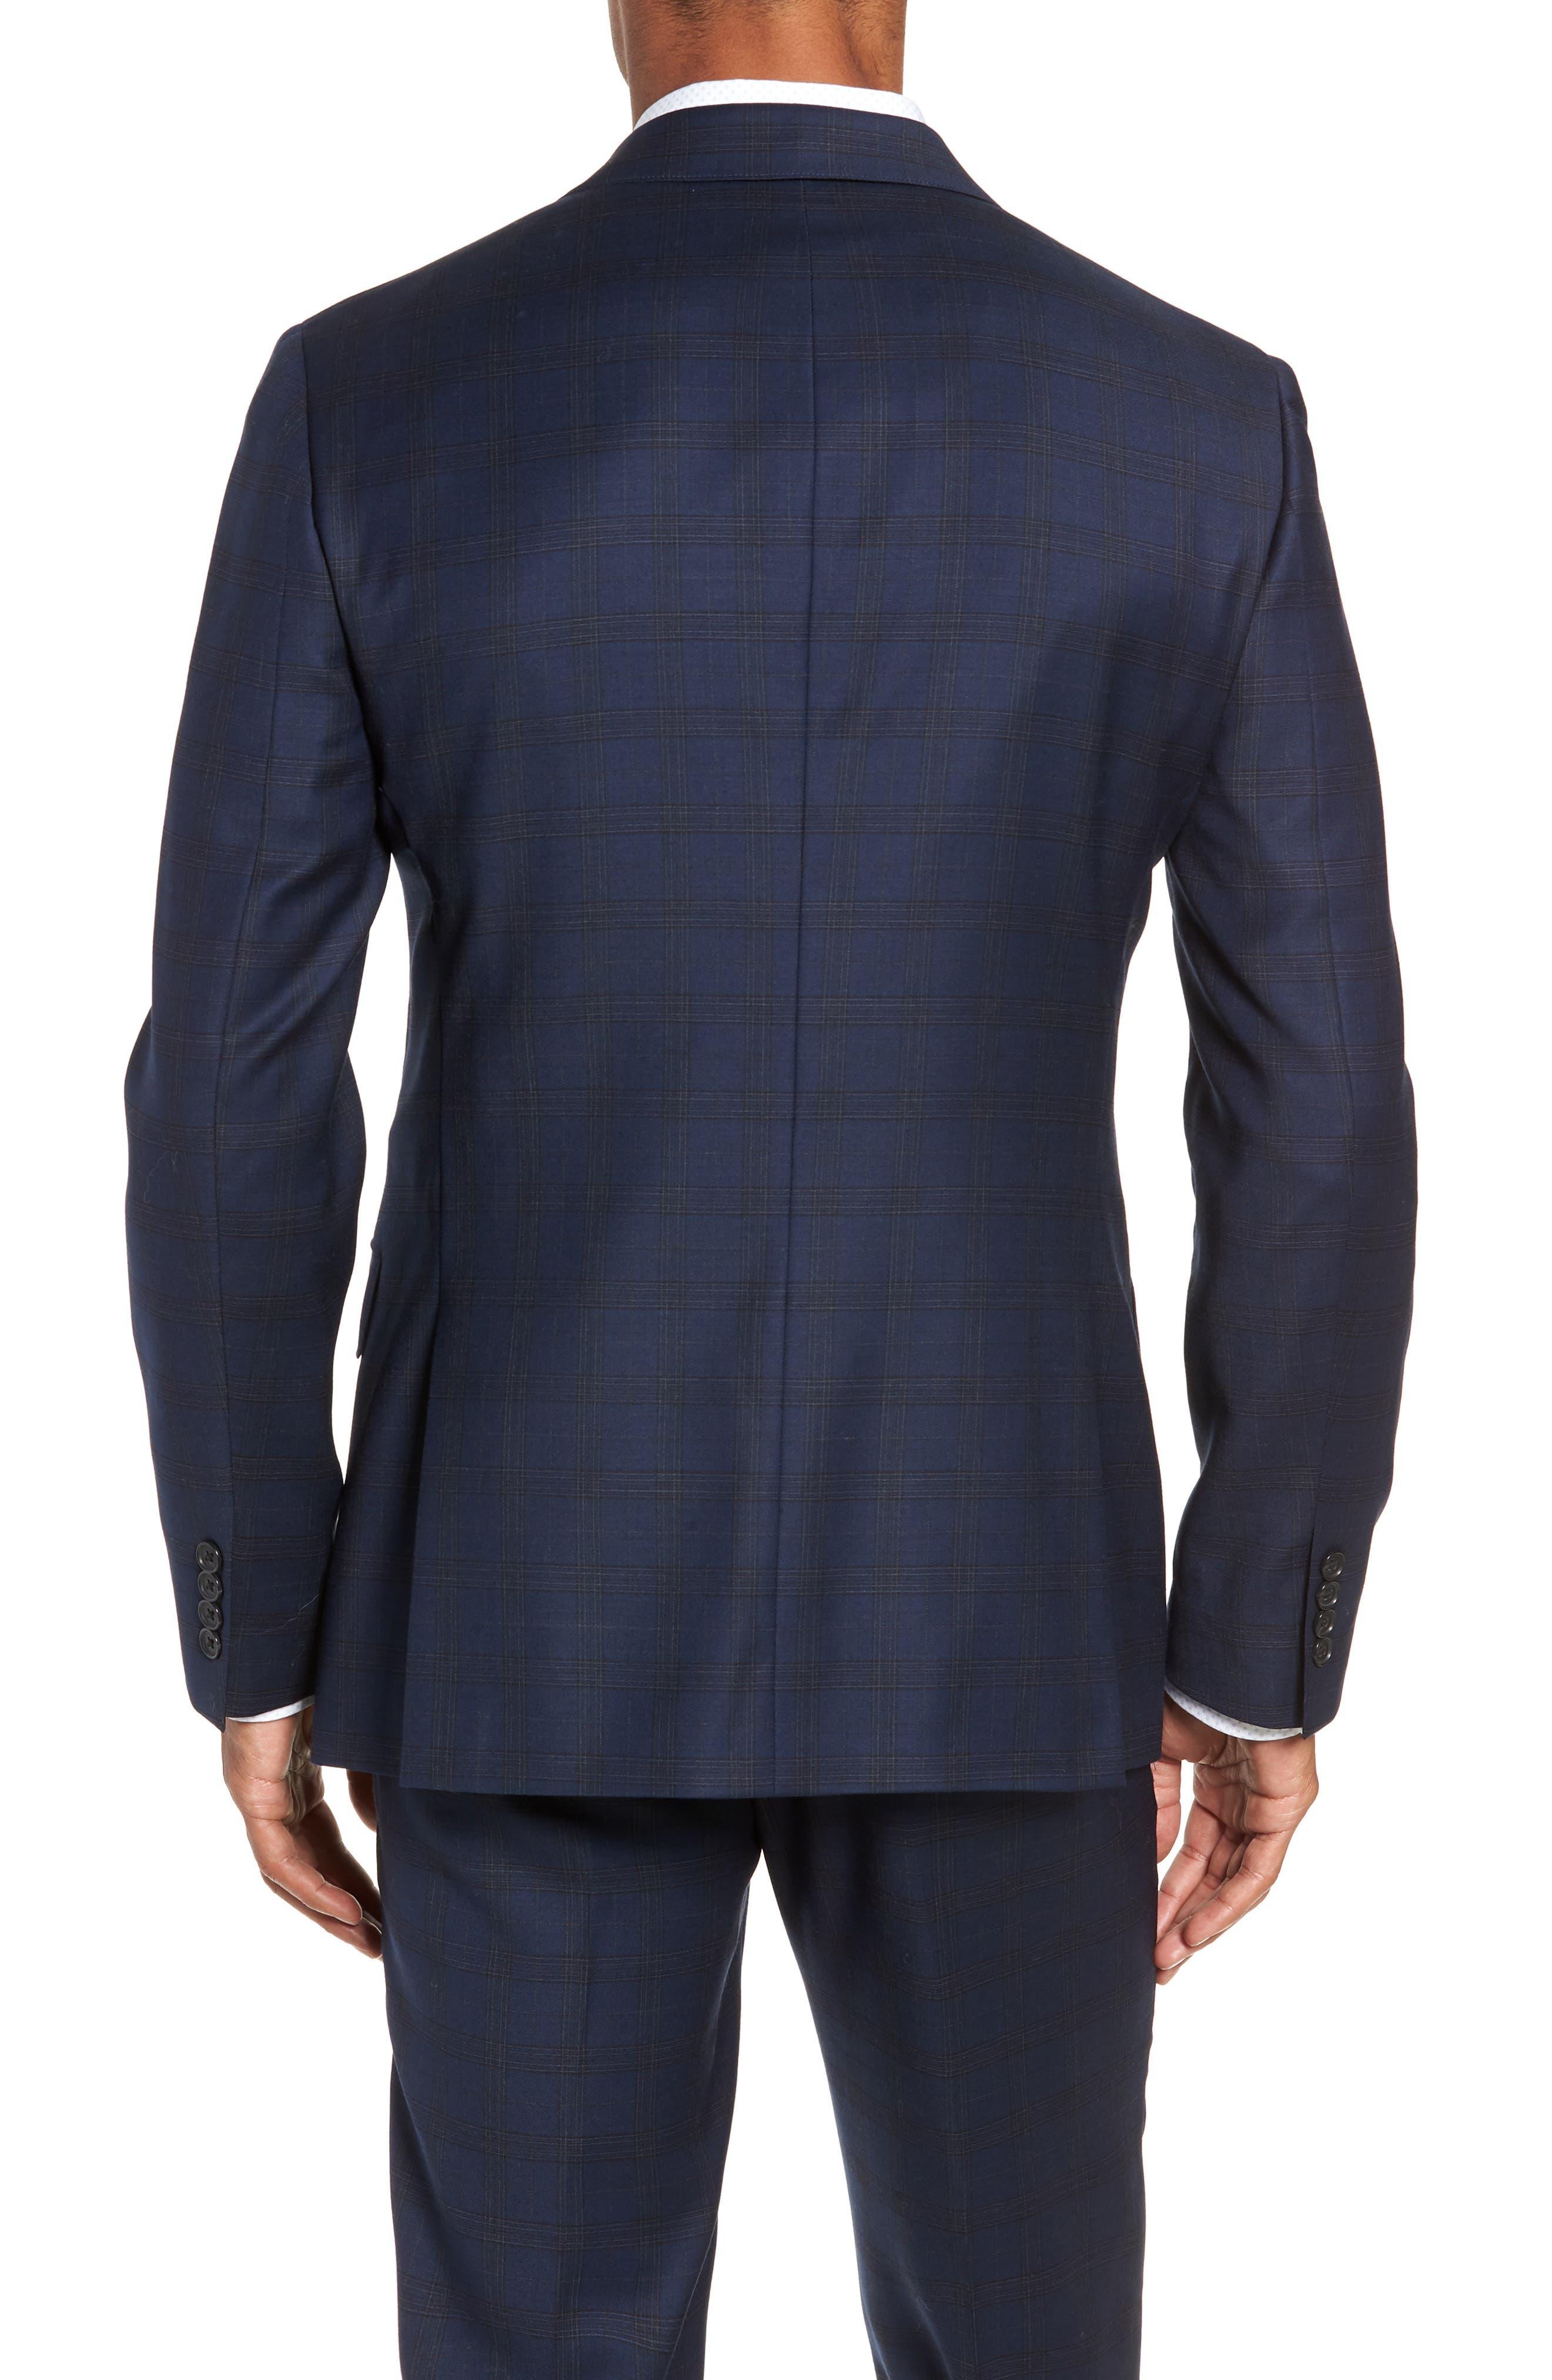 Jetsetter Slim Fit Stretch Wool Sport Coat,                         Main,                         color, SUBTLE NAVY PLAID